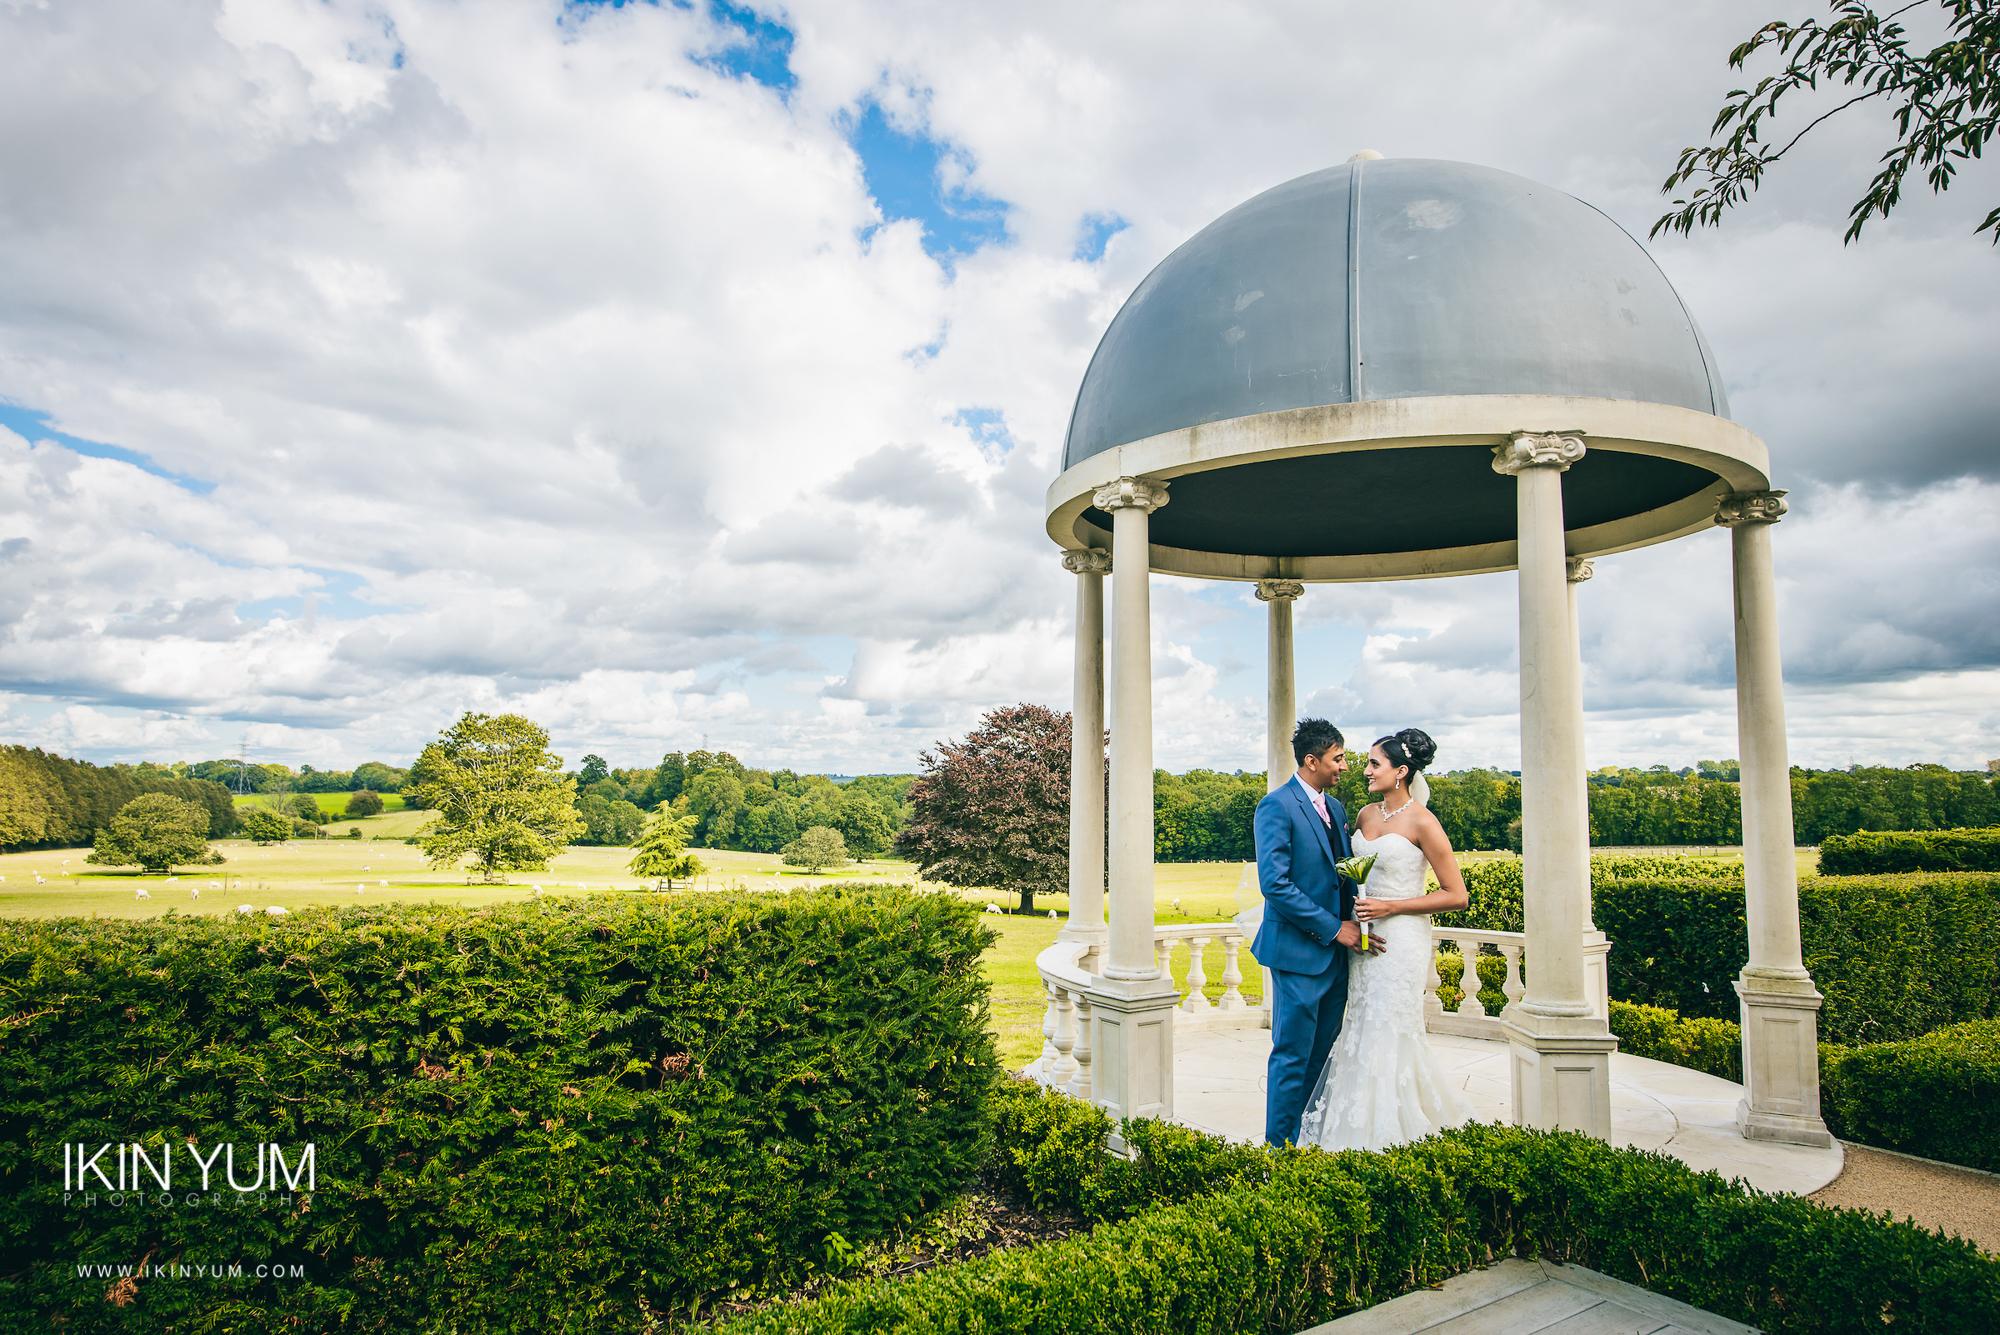 Froyle Park Indian Wedding - Ikin Yum Photography-095.jpg